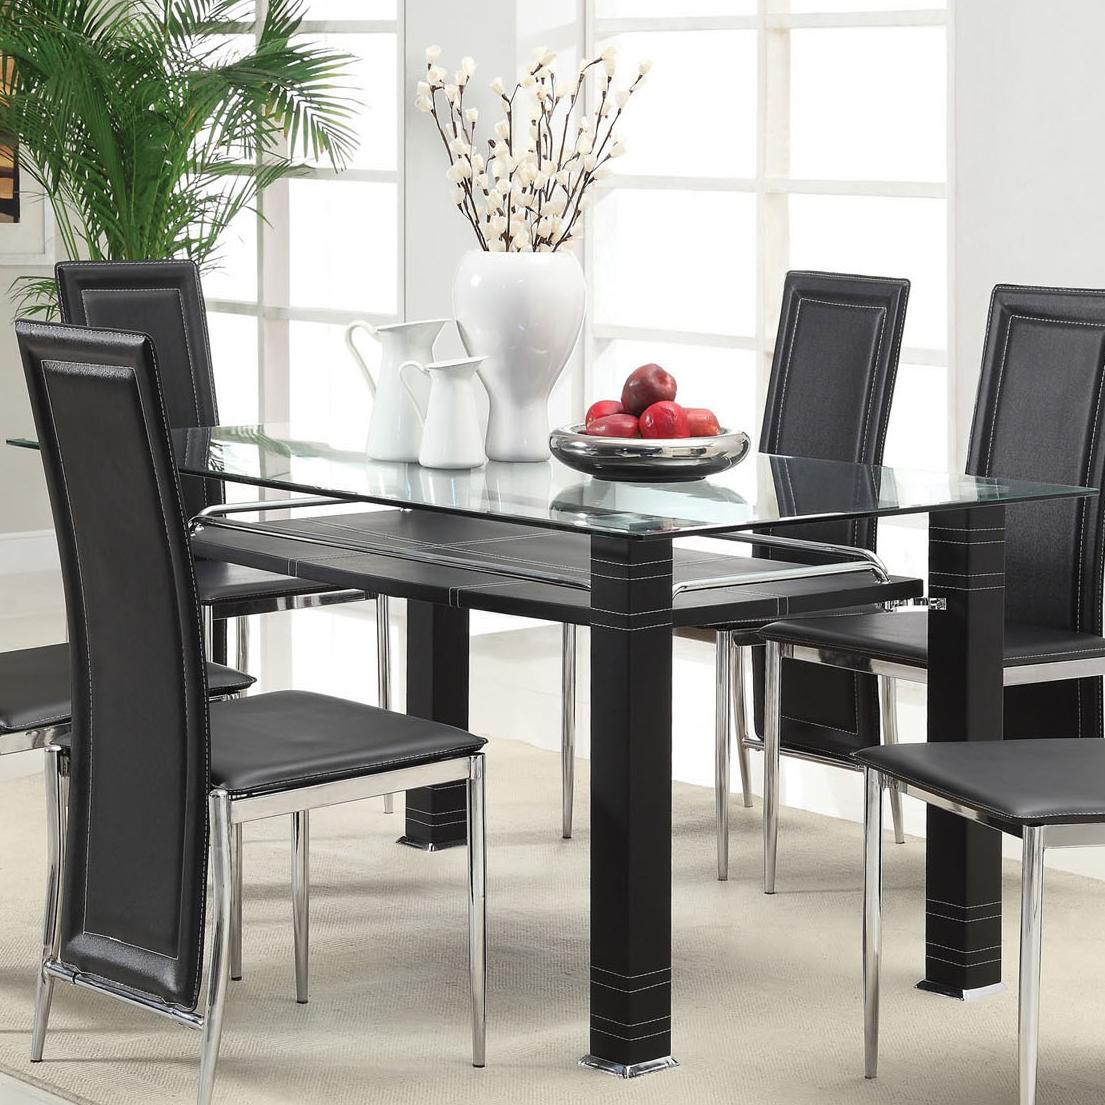 Acme Furniture Riggan Dining Table - Item Number: 60208